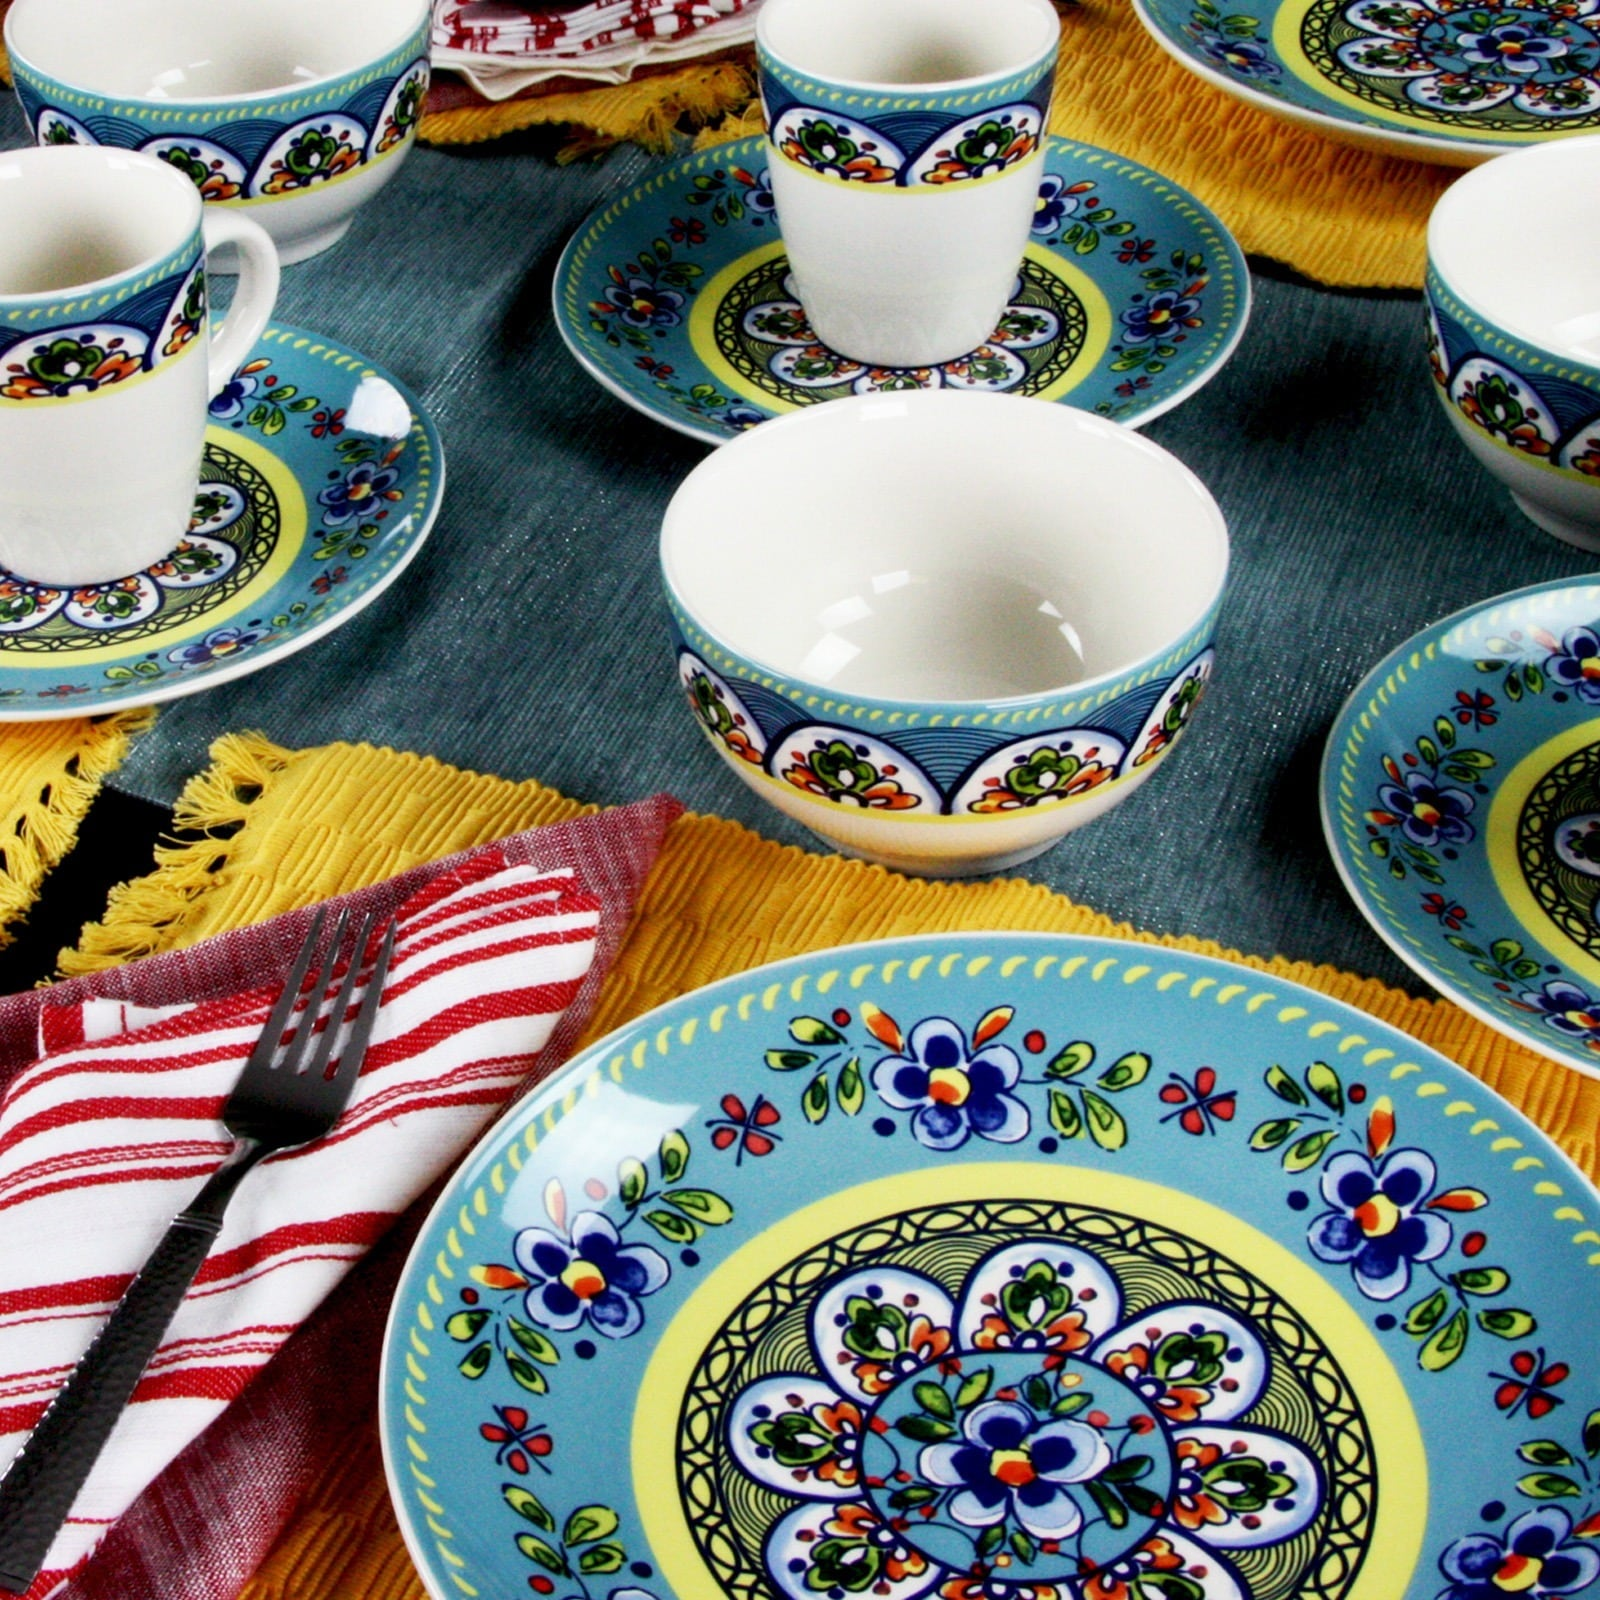 Shop Elama Santa Fe Springs Multicolored Stoneware 16-piece Dinnerware Set - Free Shipping Today - Overstock.com - 12990746 & Shop Elama Santa Fe Springs Multicolored Stoneware 16-piece ...